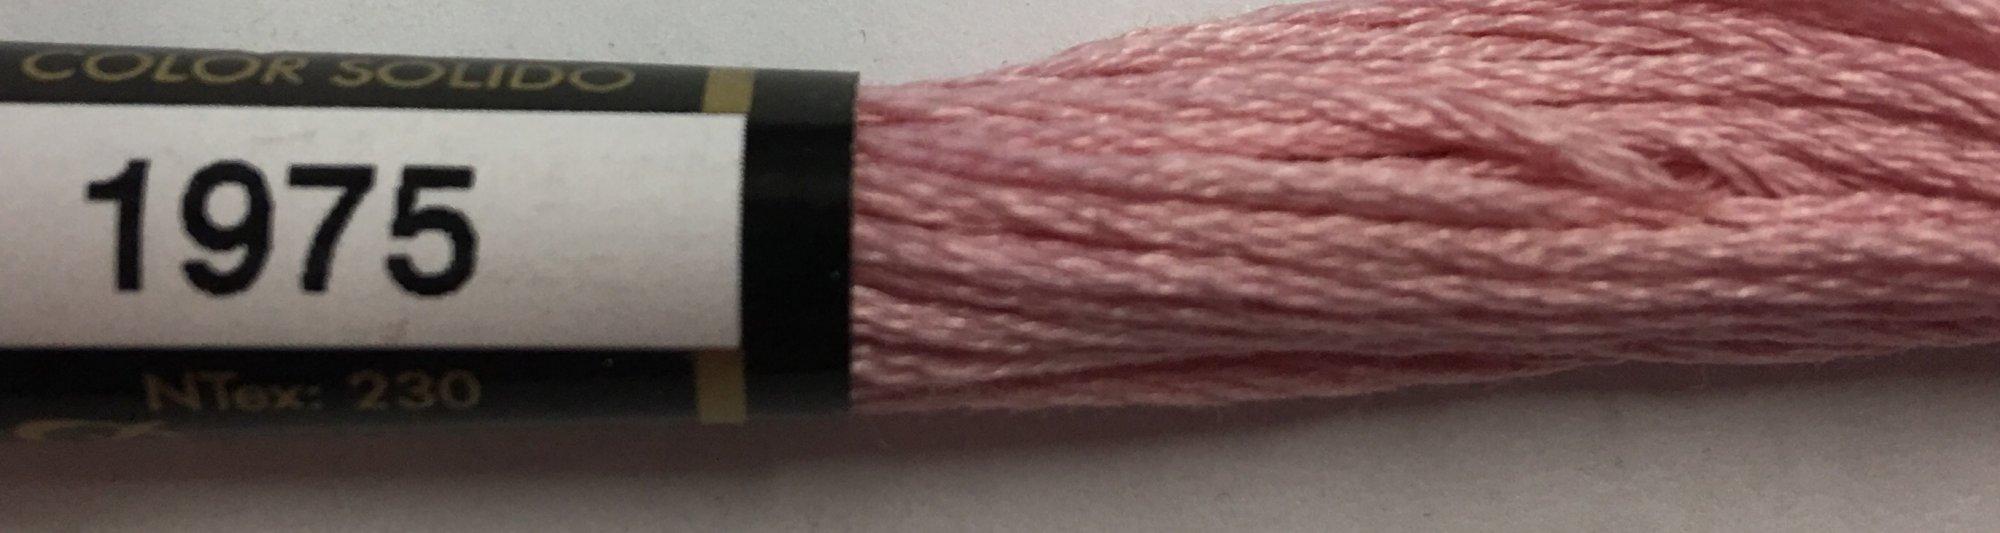 F1975 Presencia100% Mercerized Finca Cotton 6 ply Embroidery Floss 8 meter skein